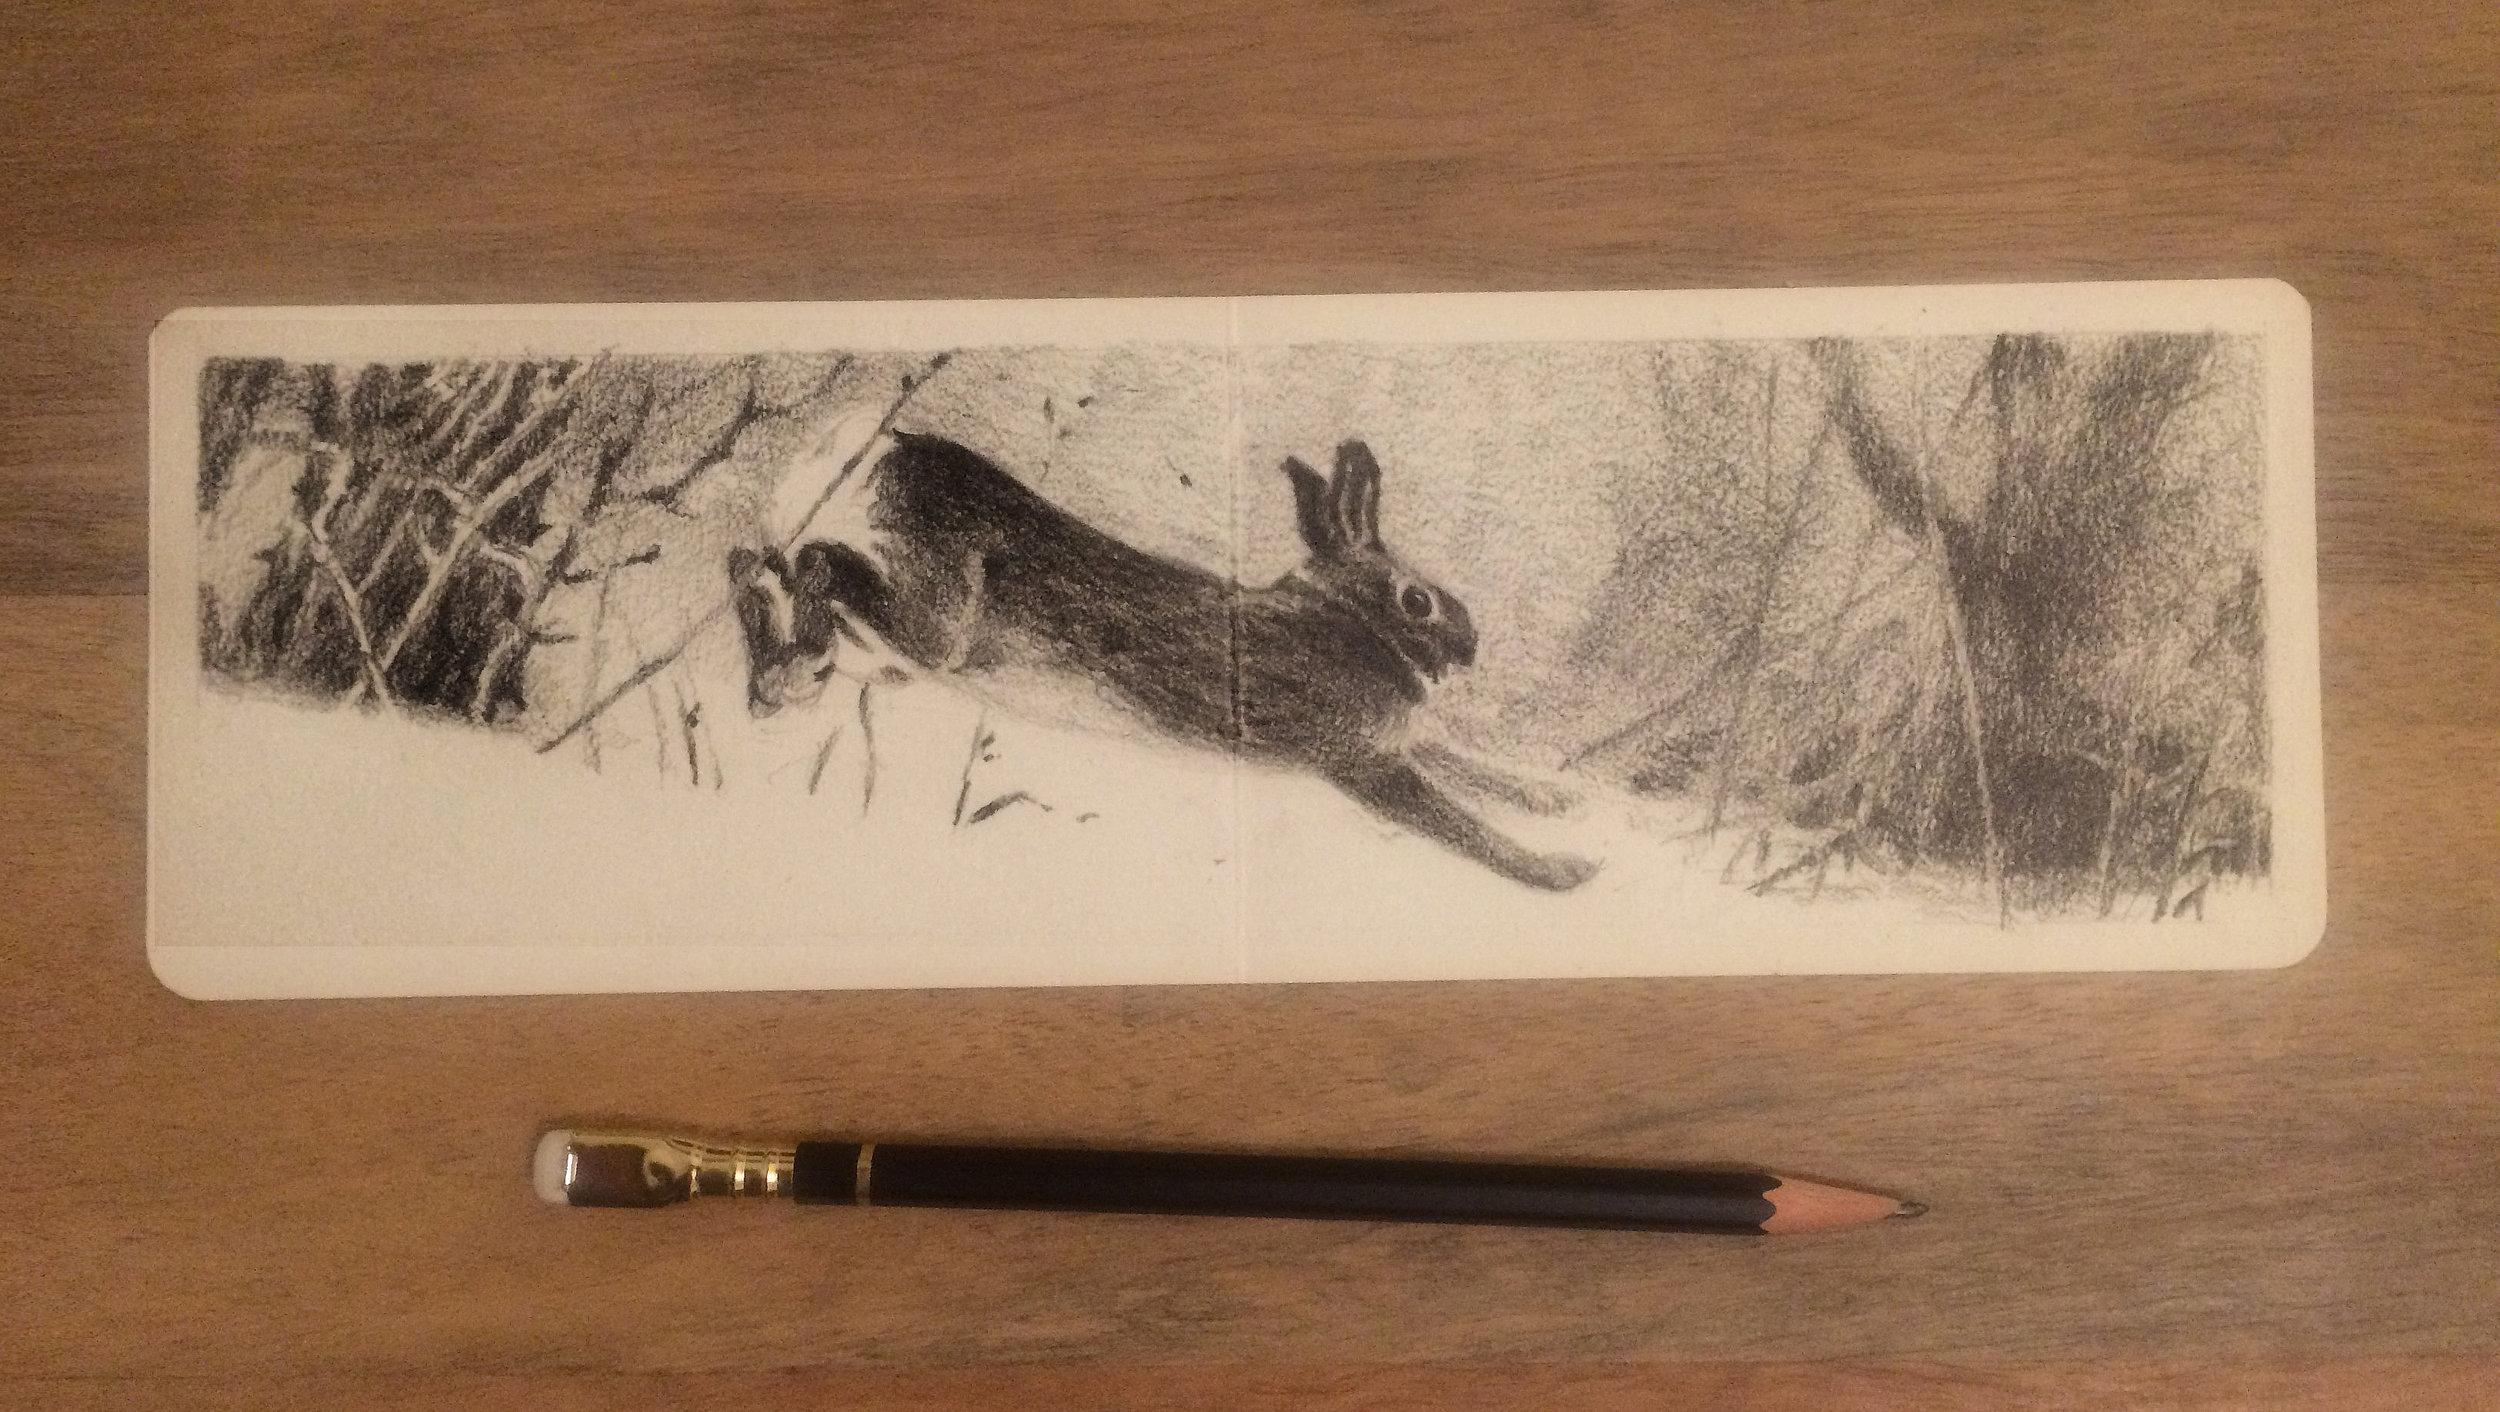 RAFAEL MARTIN C Sketchbook_005.jpg